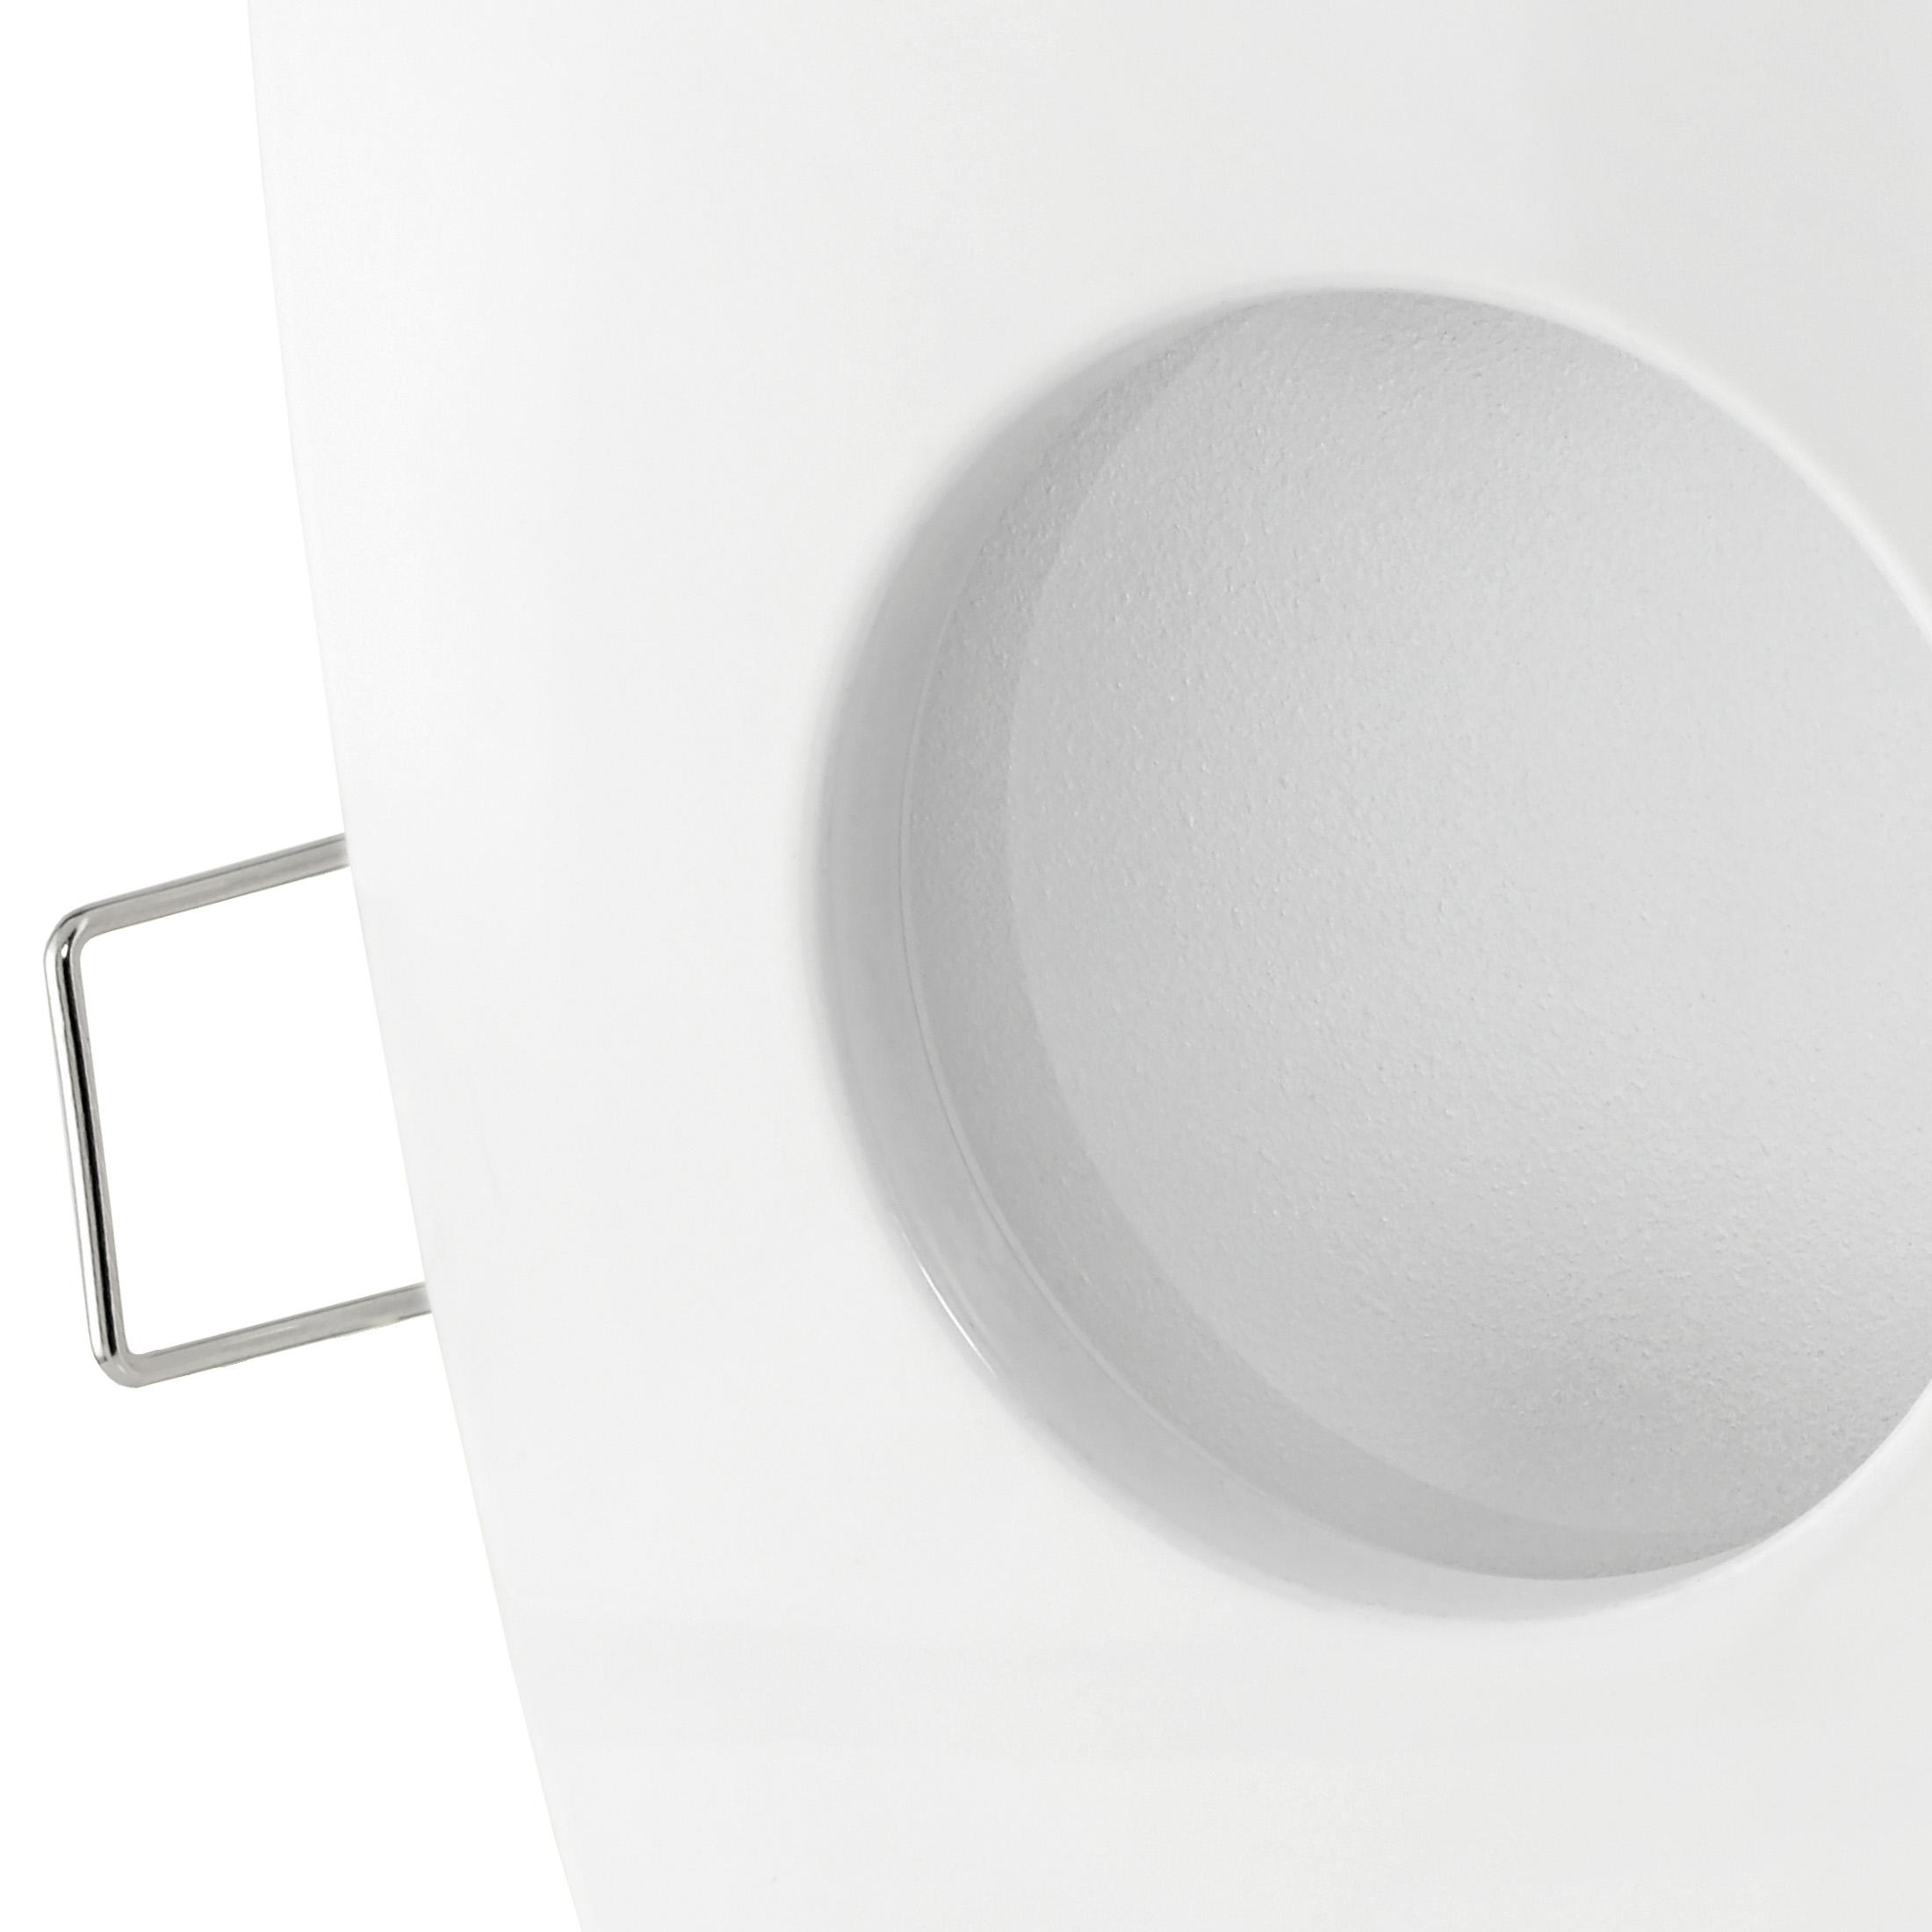 qw 1 led einbaustrahler weiss bad dusche aussenbereich feuchtraum ip65 5w smd led neutral. Black Bedroom Furniture Sets. Home Design Ideas